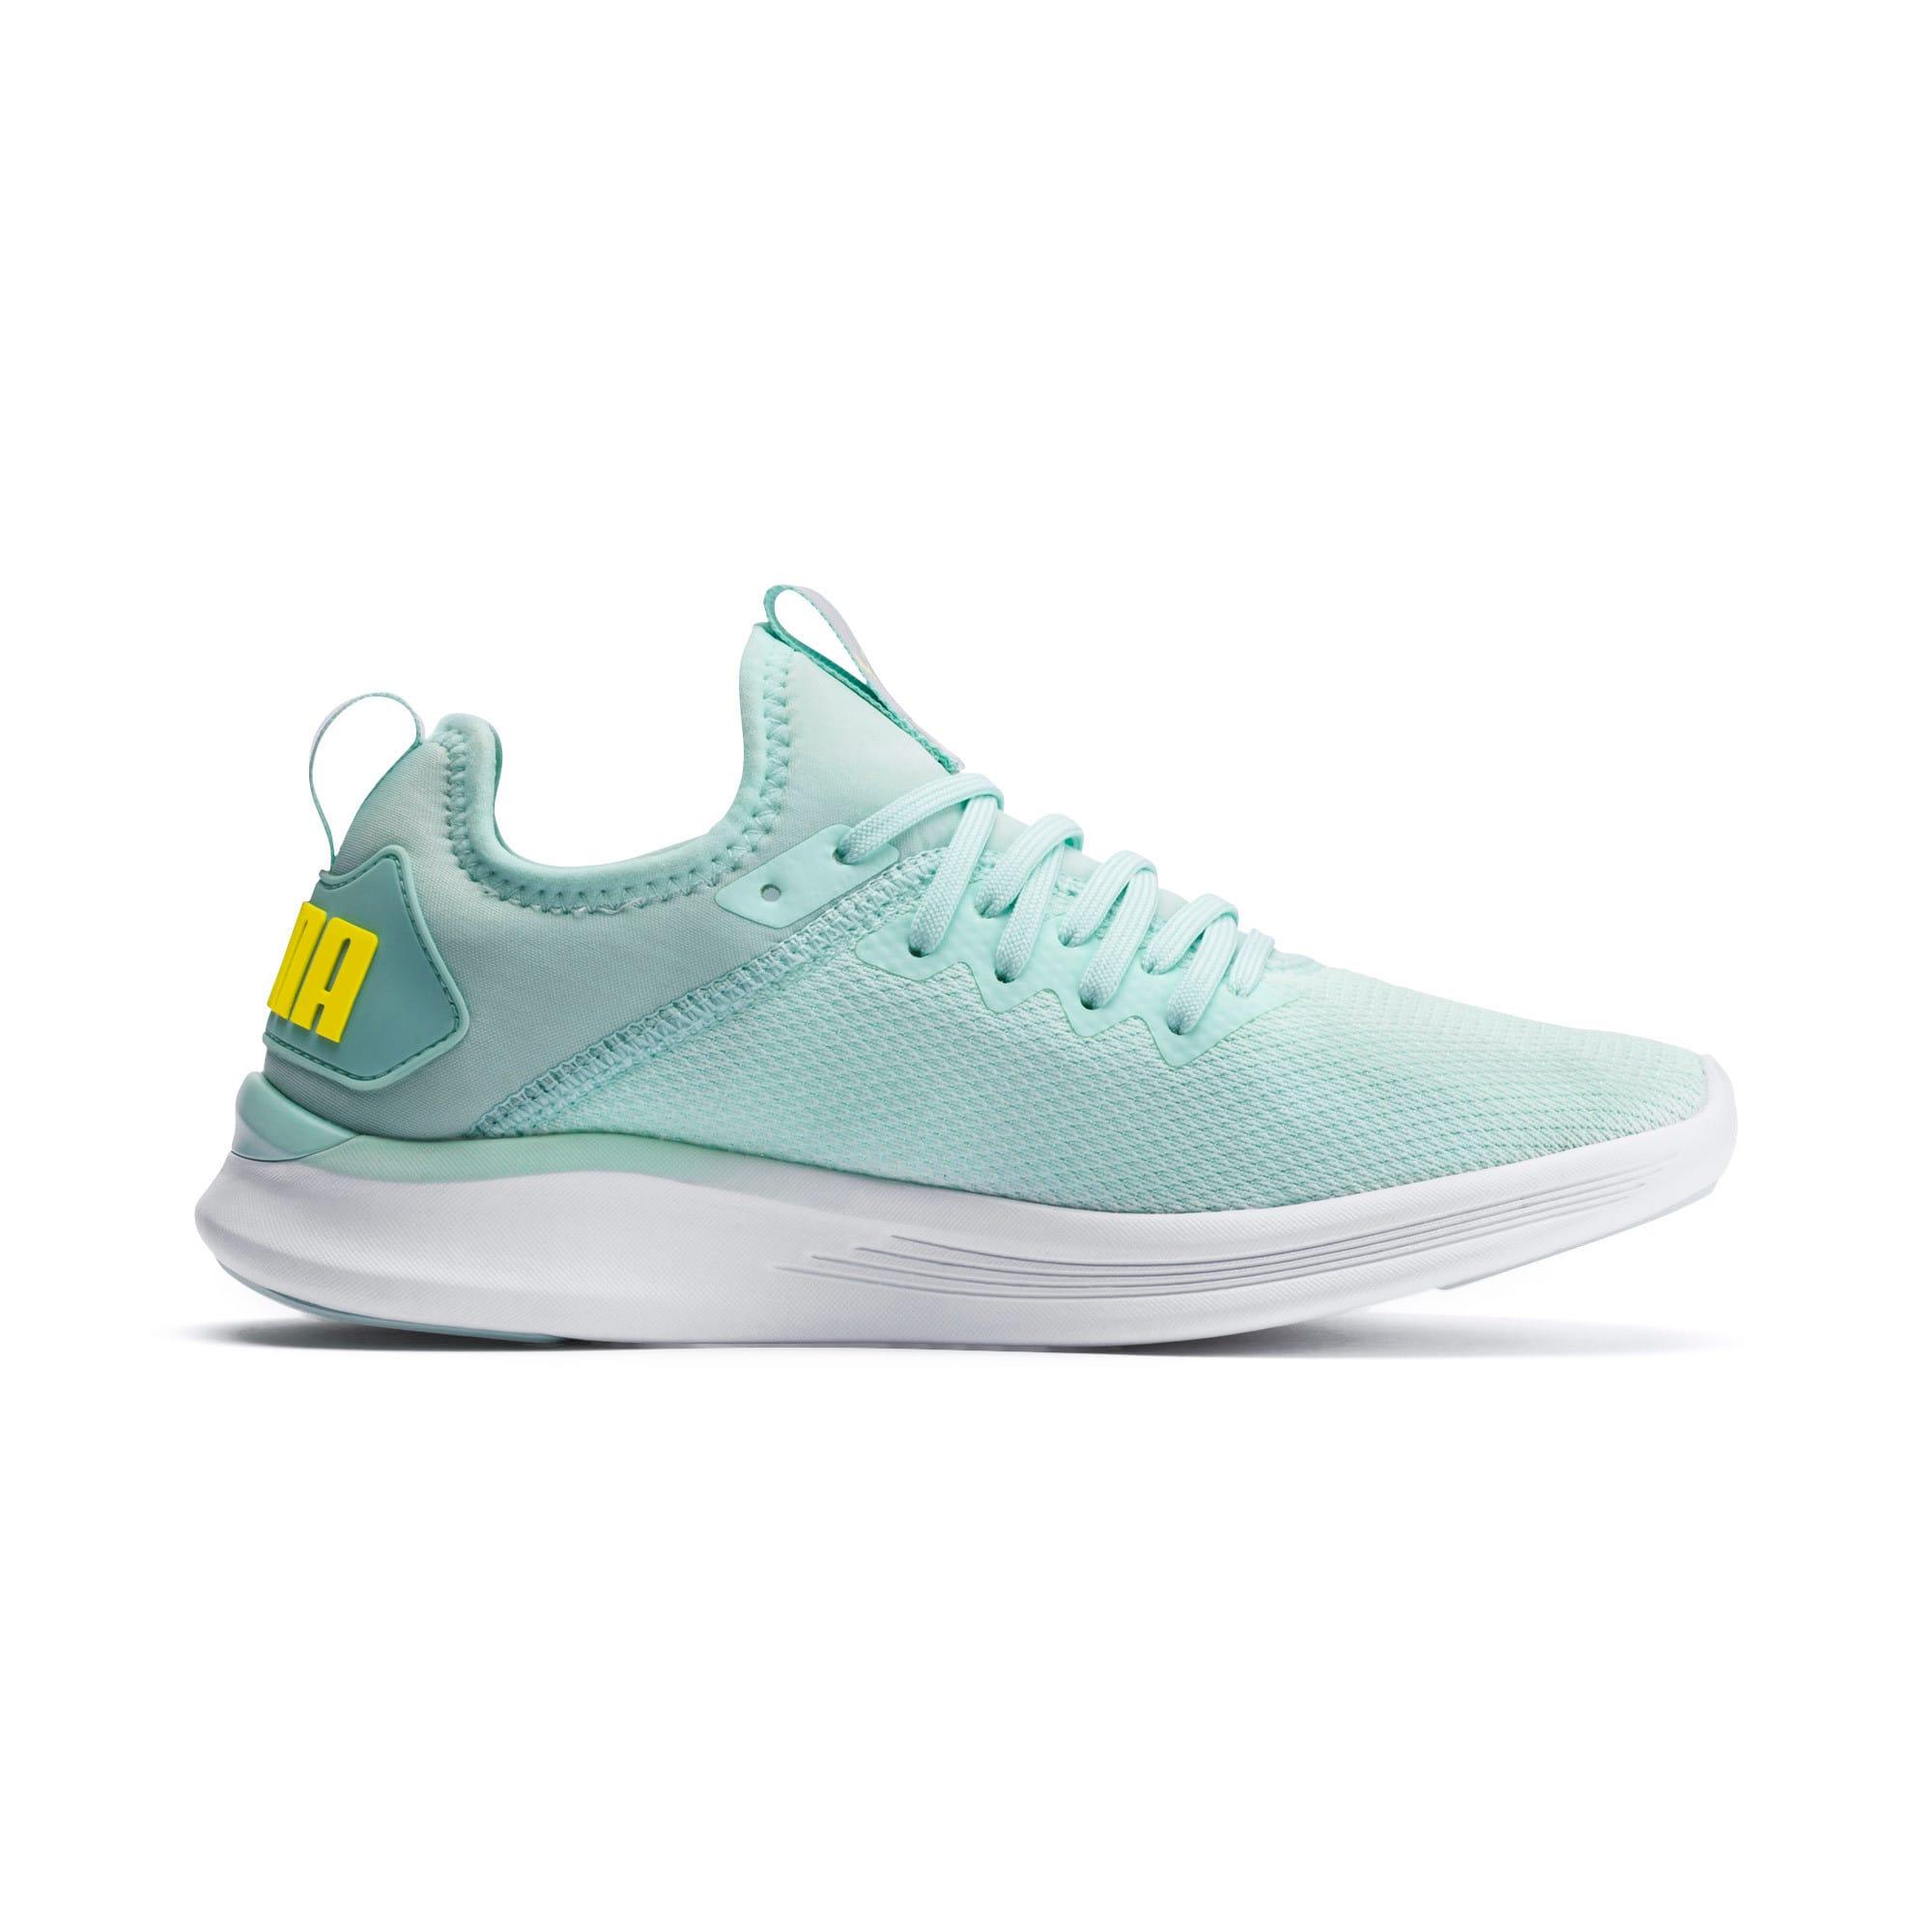 Thumbnail 5 of IGNITE Flash evoKNIT Women's Running Shoes, Fair Aqua-Blazing Yellow, medium-IND